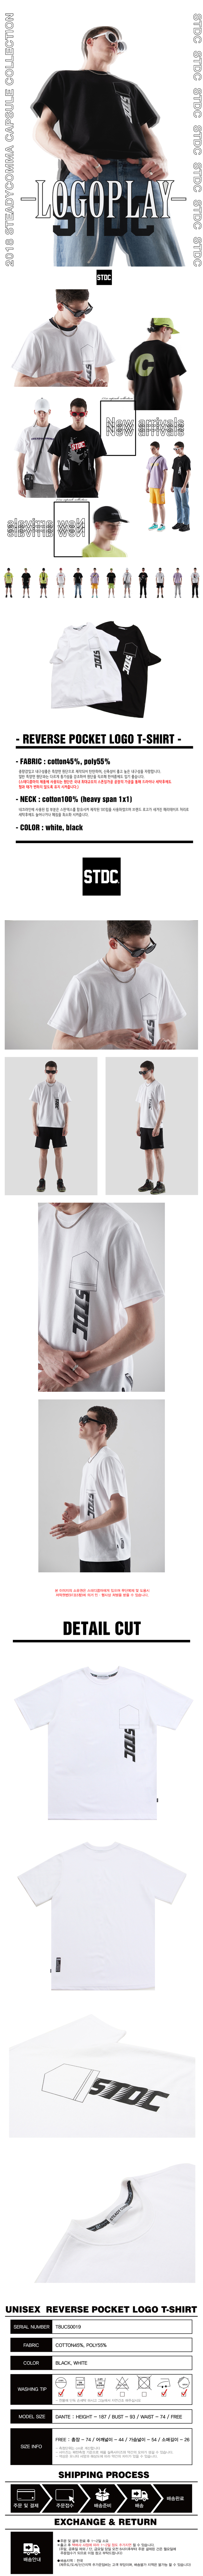 REVERSE POCKET LOGO T-SHIRTS WHITE.jpg